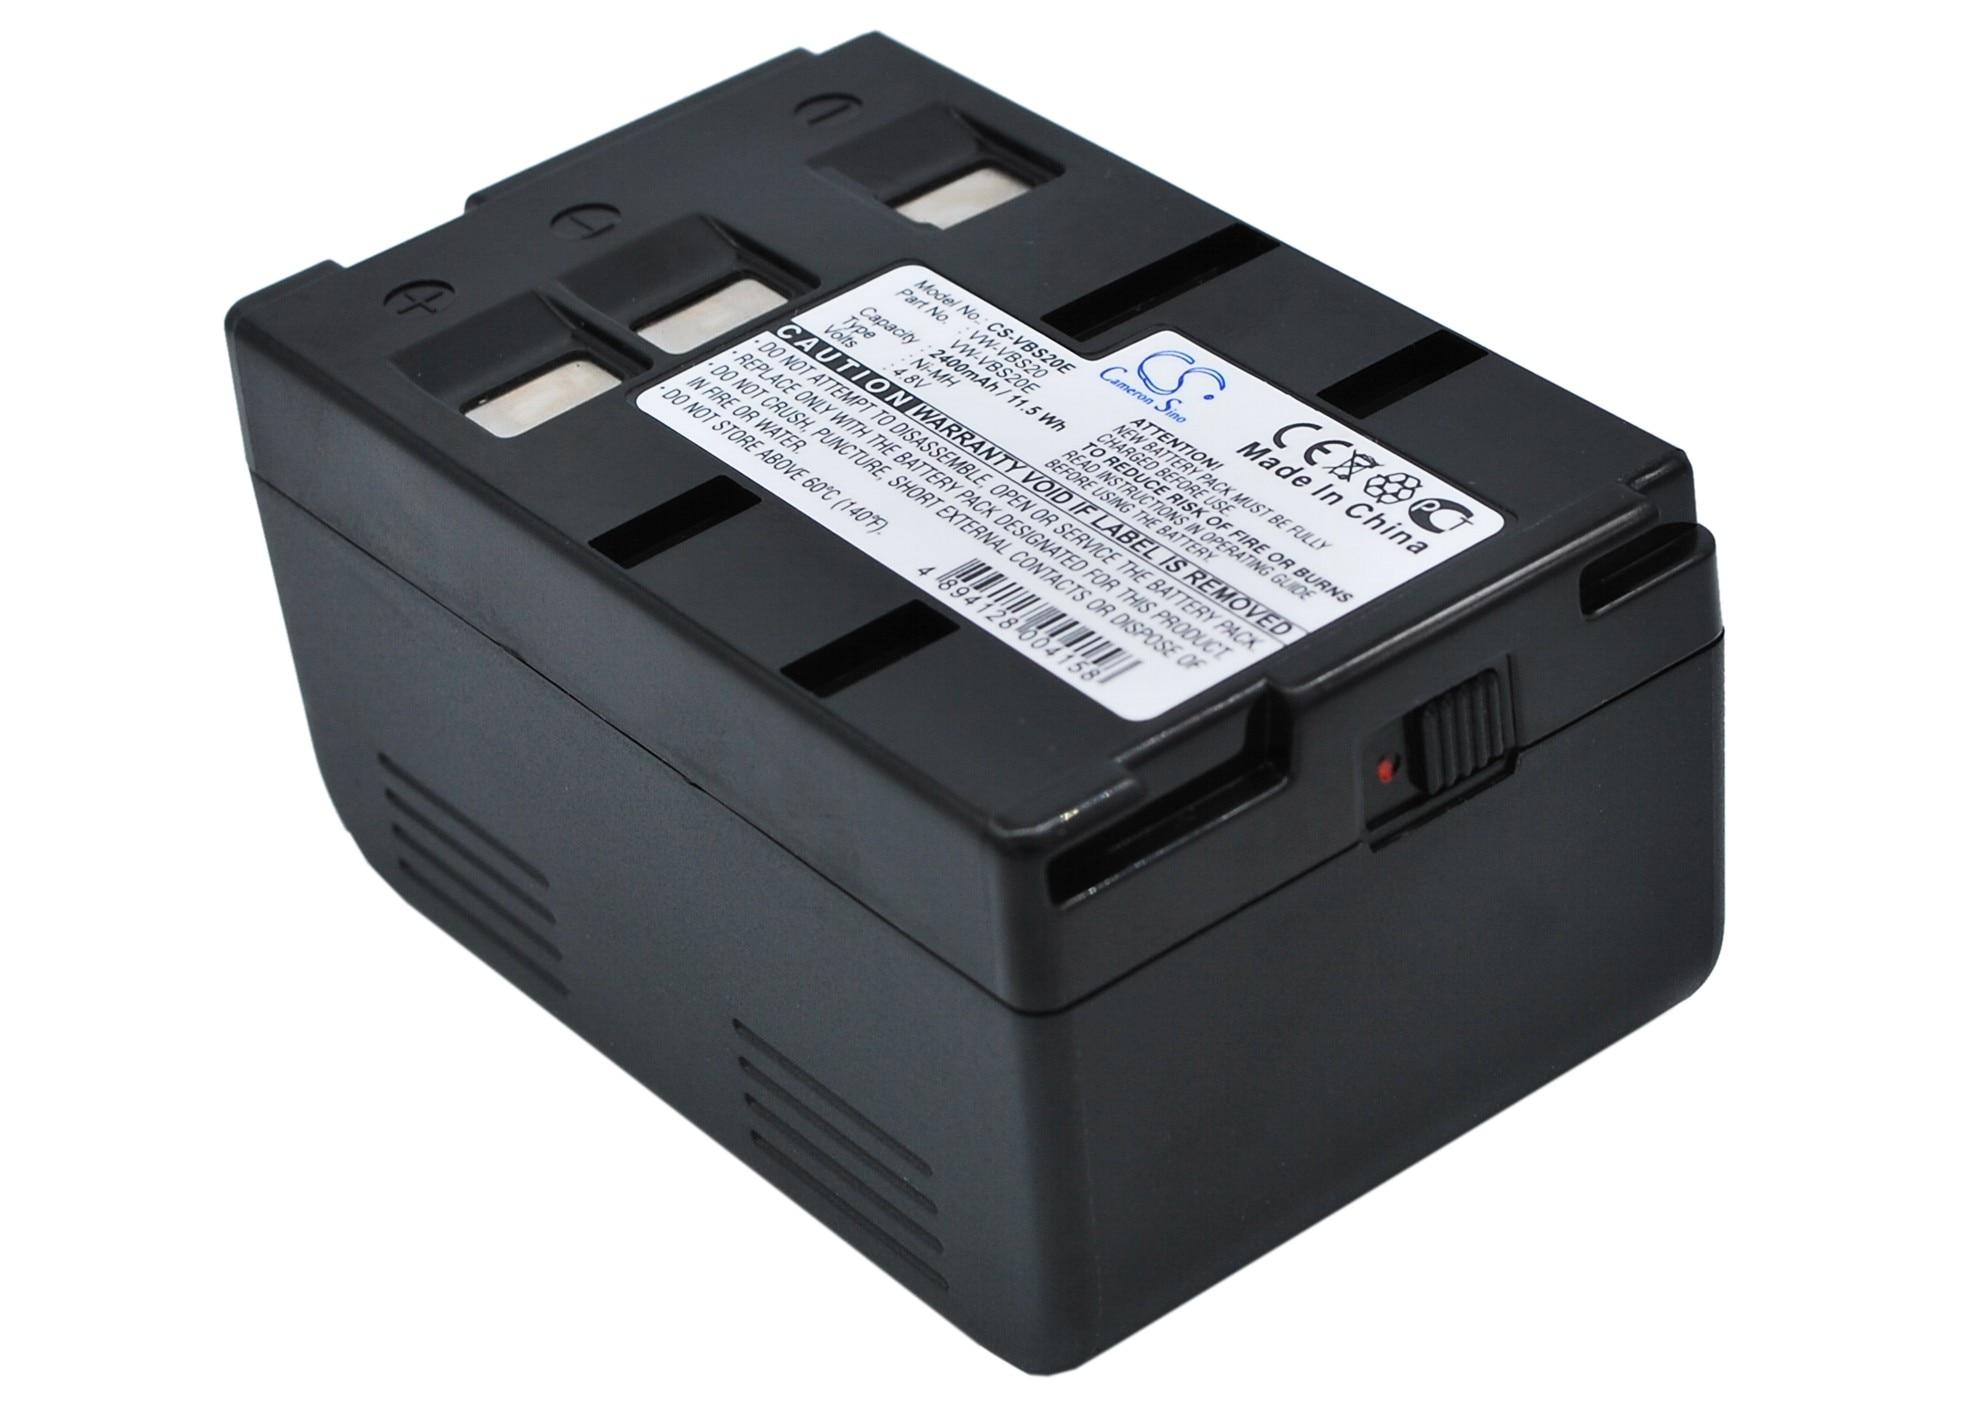 Bateria para Sony ccd-f350e ccd-tr900 ccd-fx210 ccd-v301 ccd-f201 ccd-tr400 4200mah